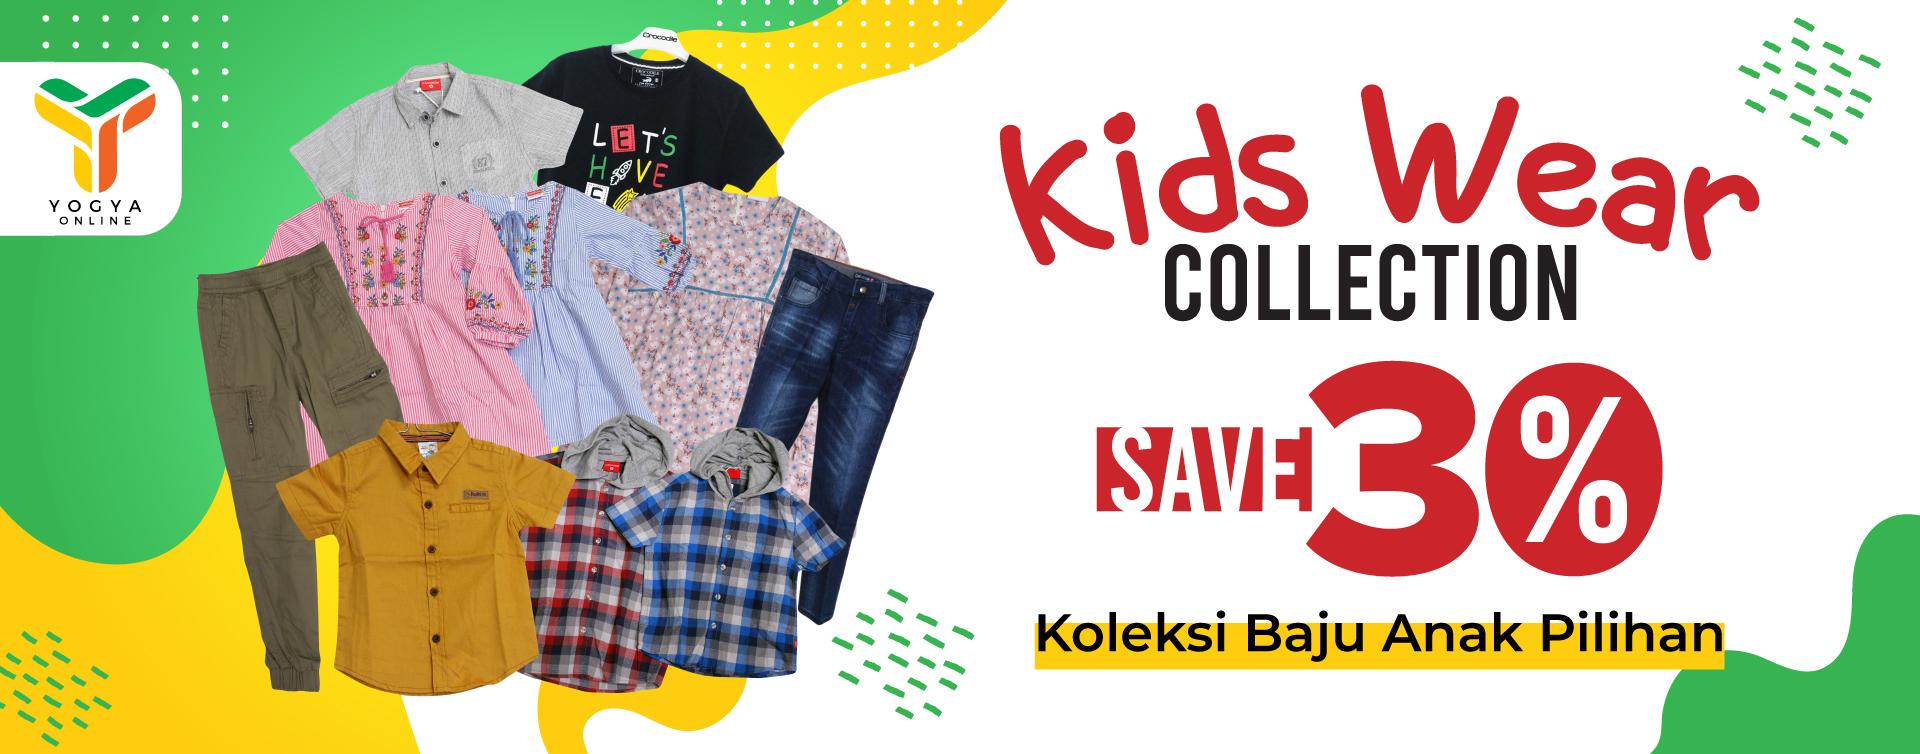 Kids Wear Collection Diskon 30%